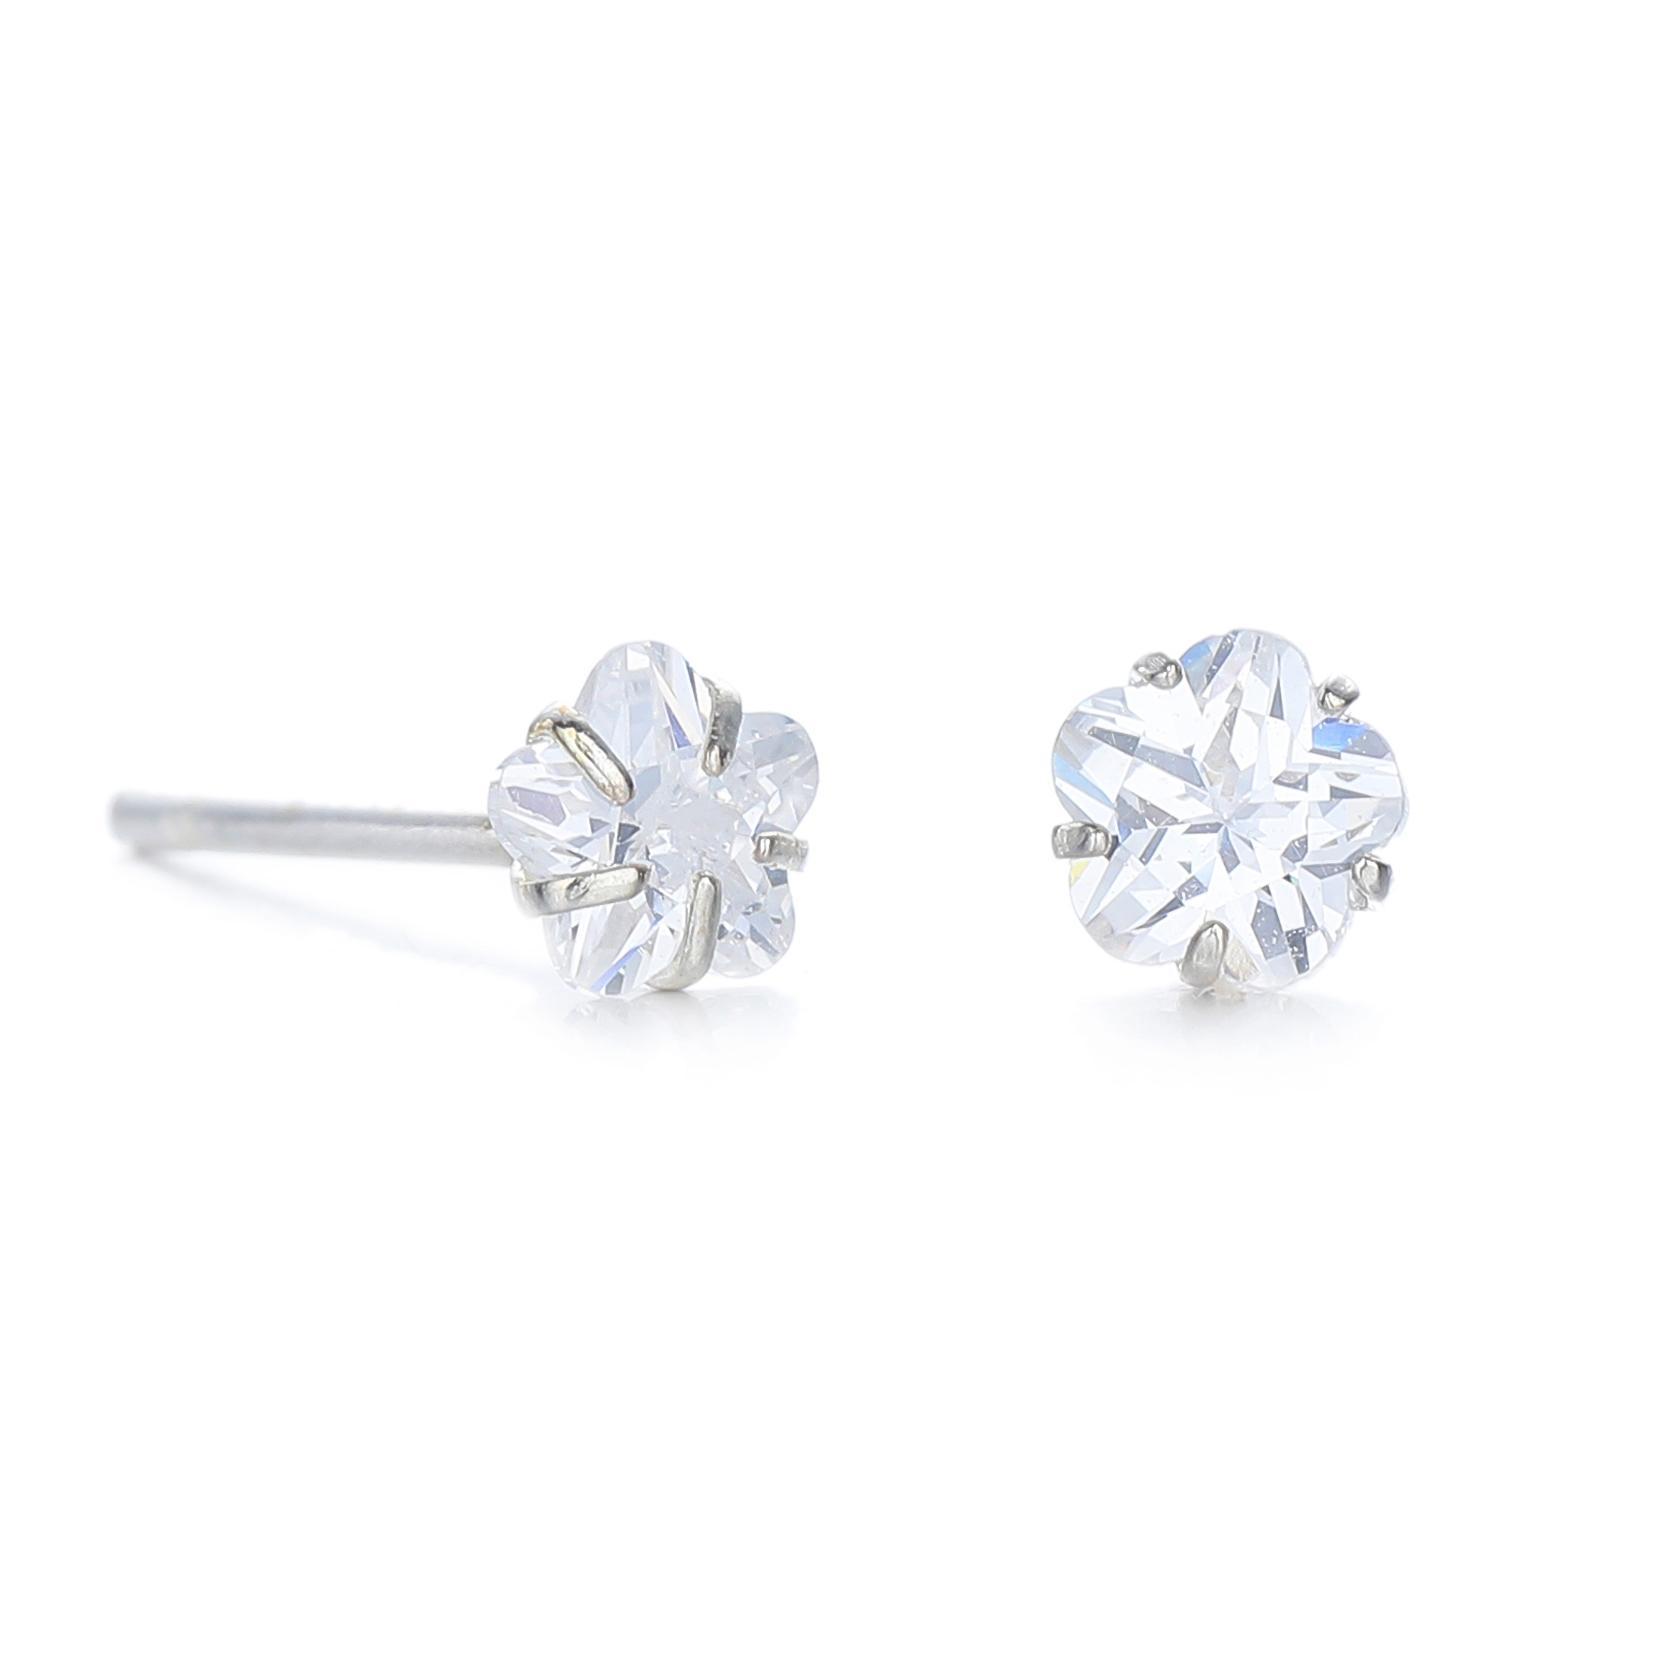 703dd67cb2e2c Silver Kingdom Original Italy 92.5 White Stone Flower Design Earrings E1054  4mm